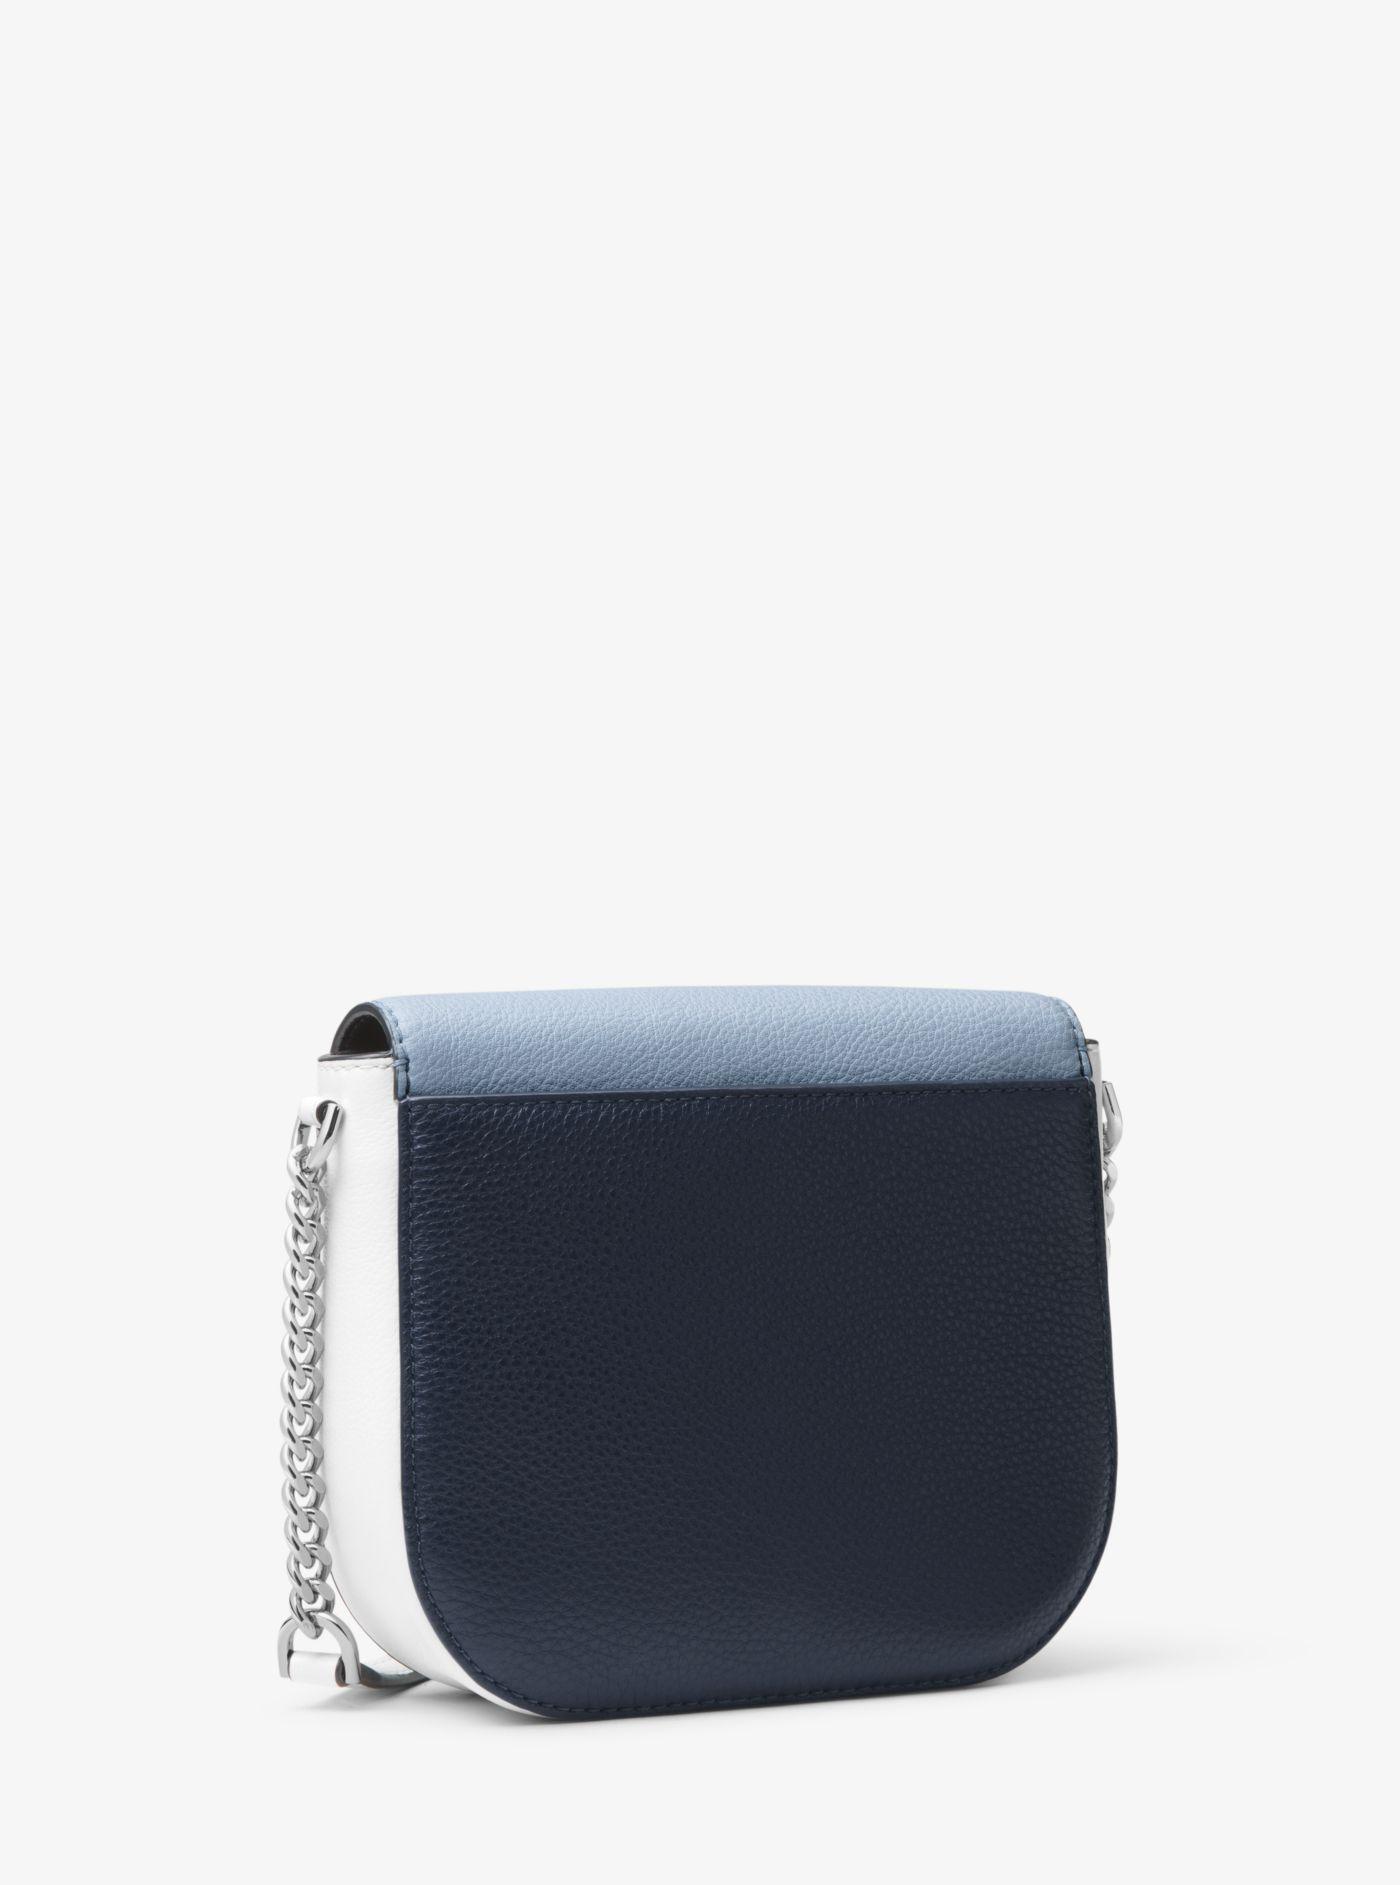 67b17c55777b73 Michael Kors Mott Color-block Leather Dome Crossbody Bag in Blue - Lyst